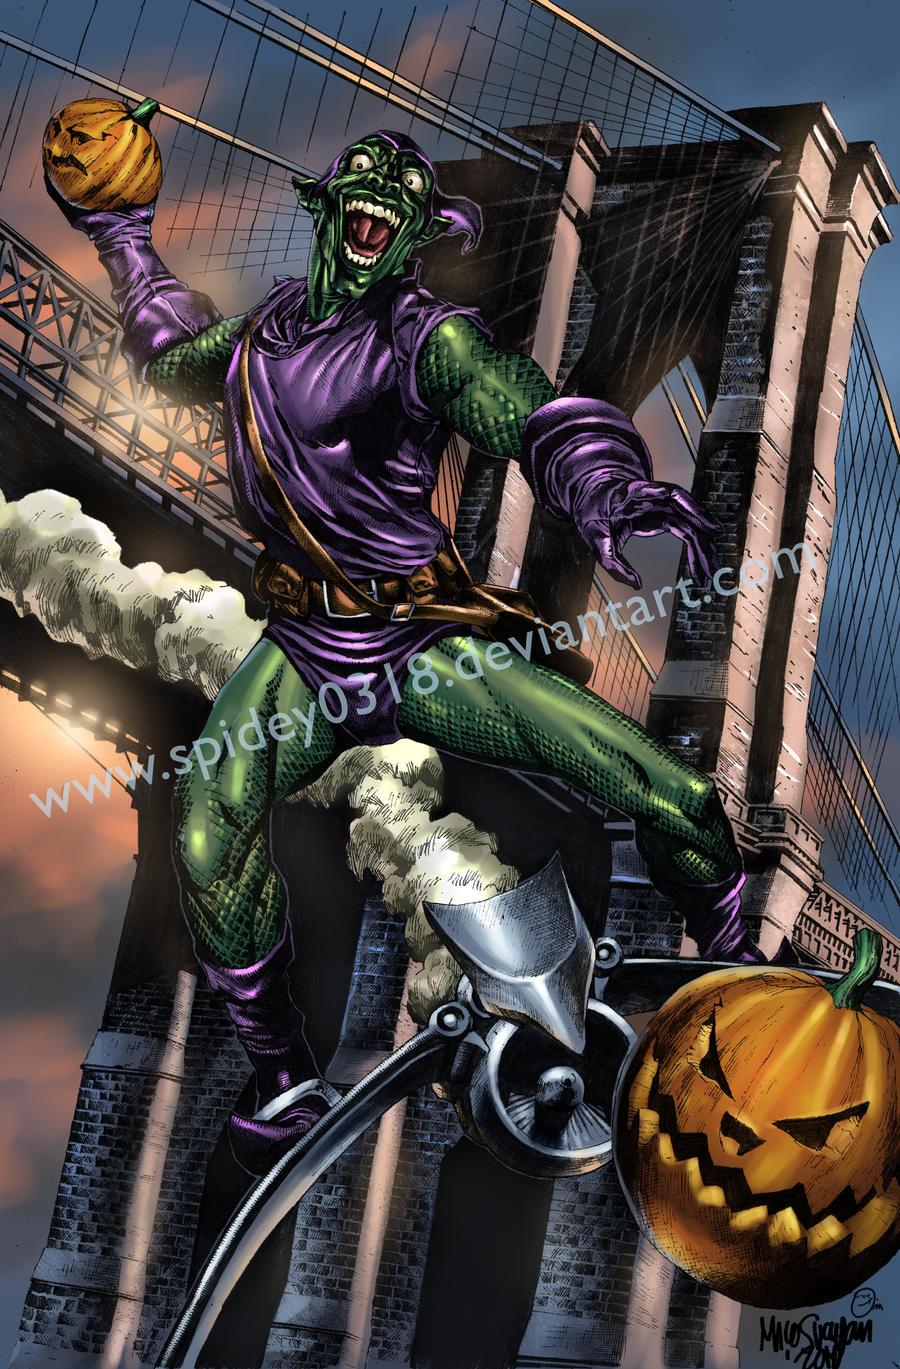 Green Goblin by spidey0318